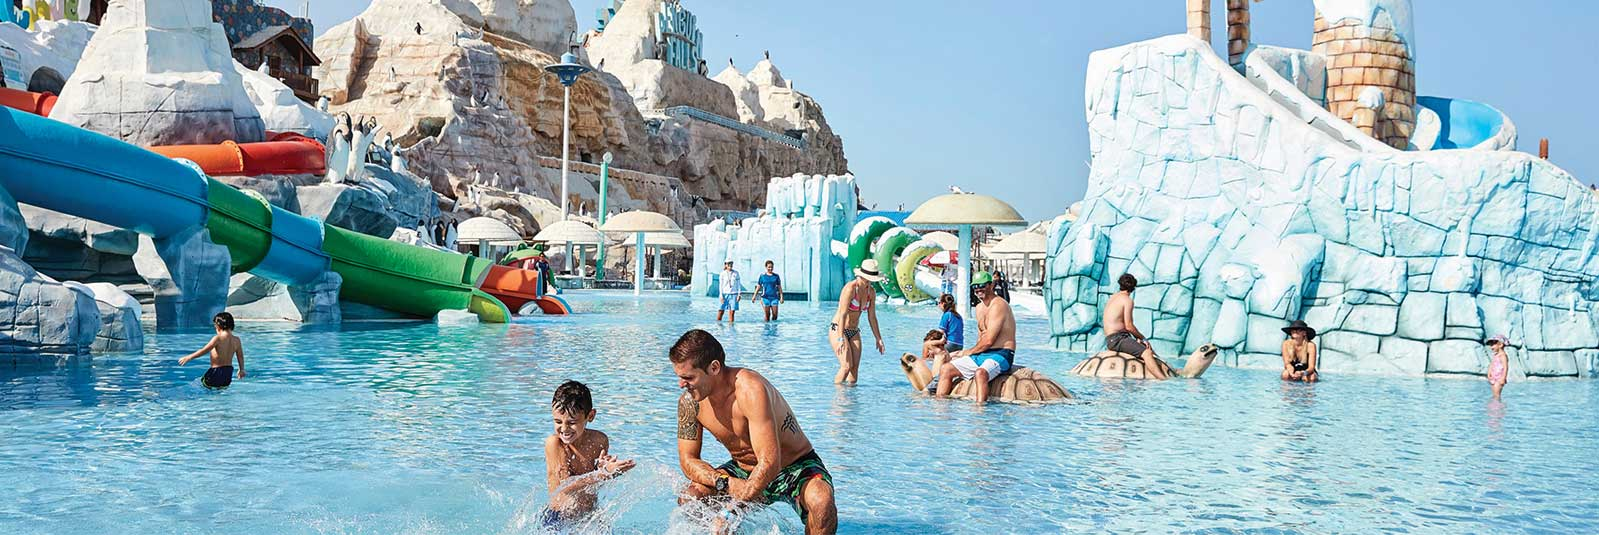 iceland-waterpark-dubai.jpg